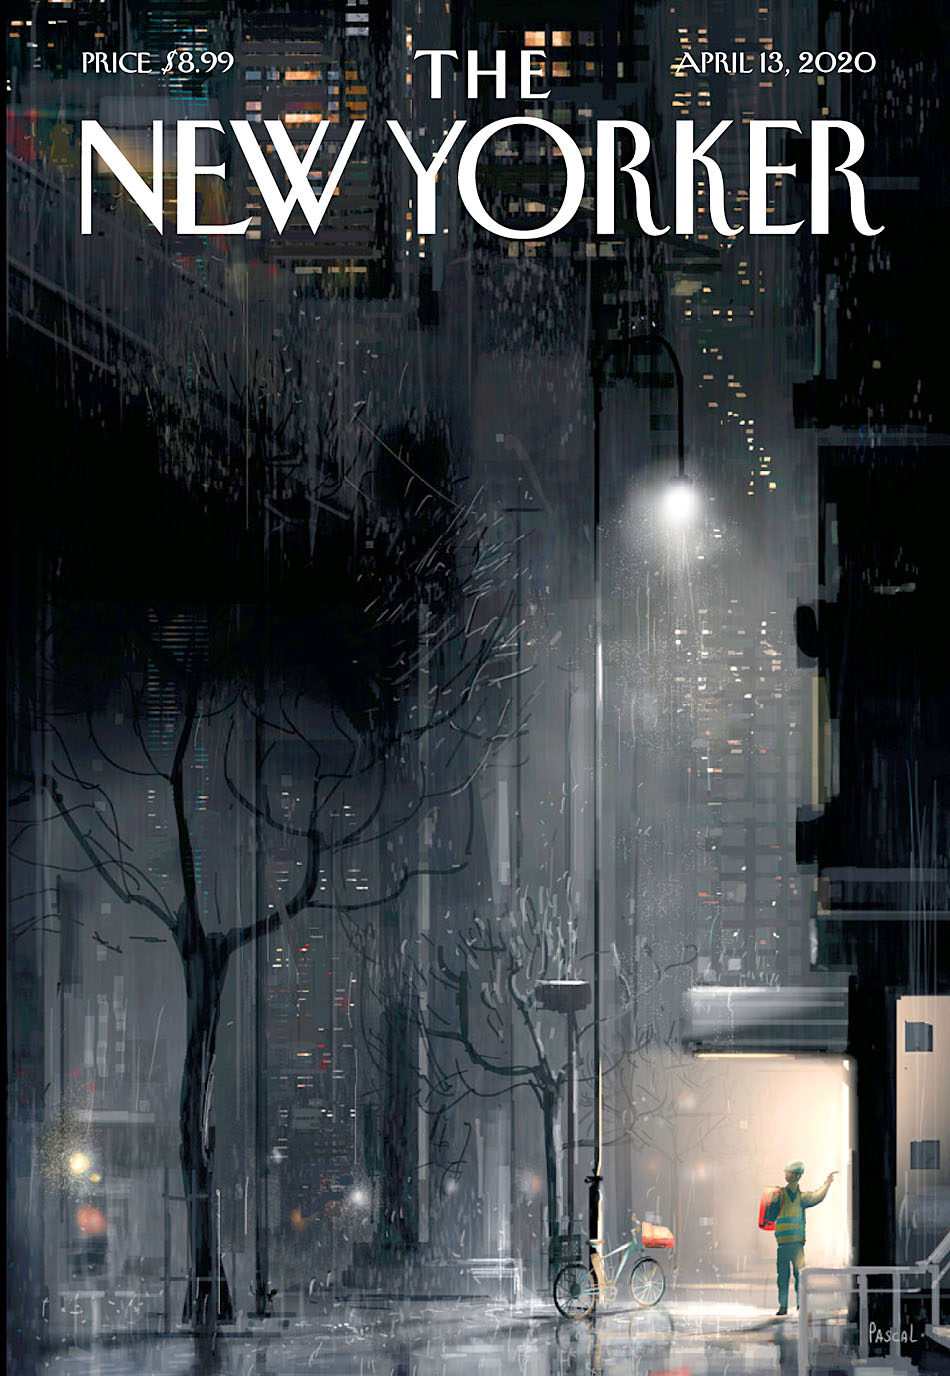 New Yorker 2020-04-13.jpg